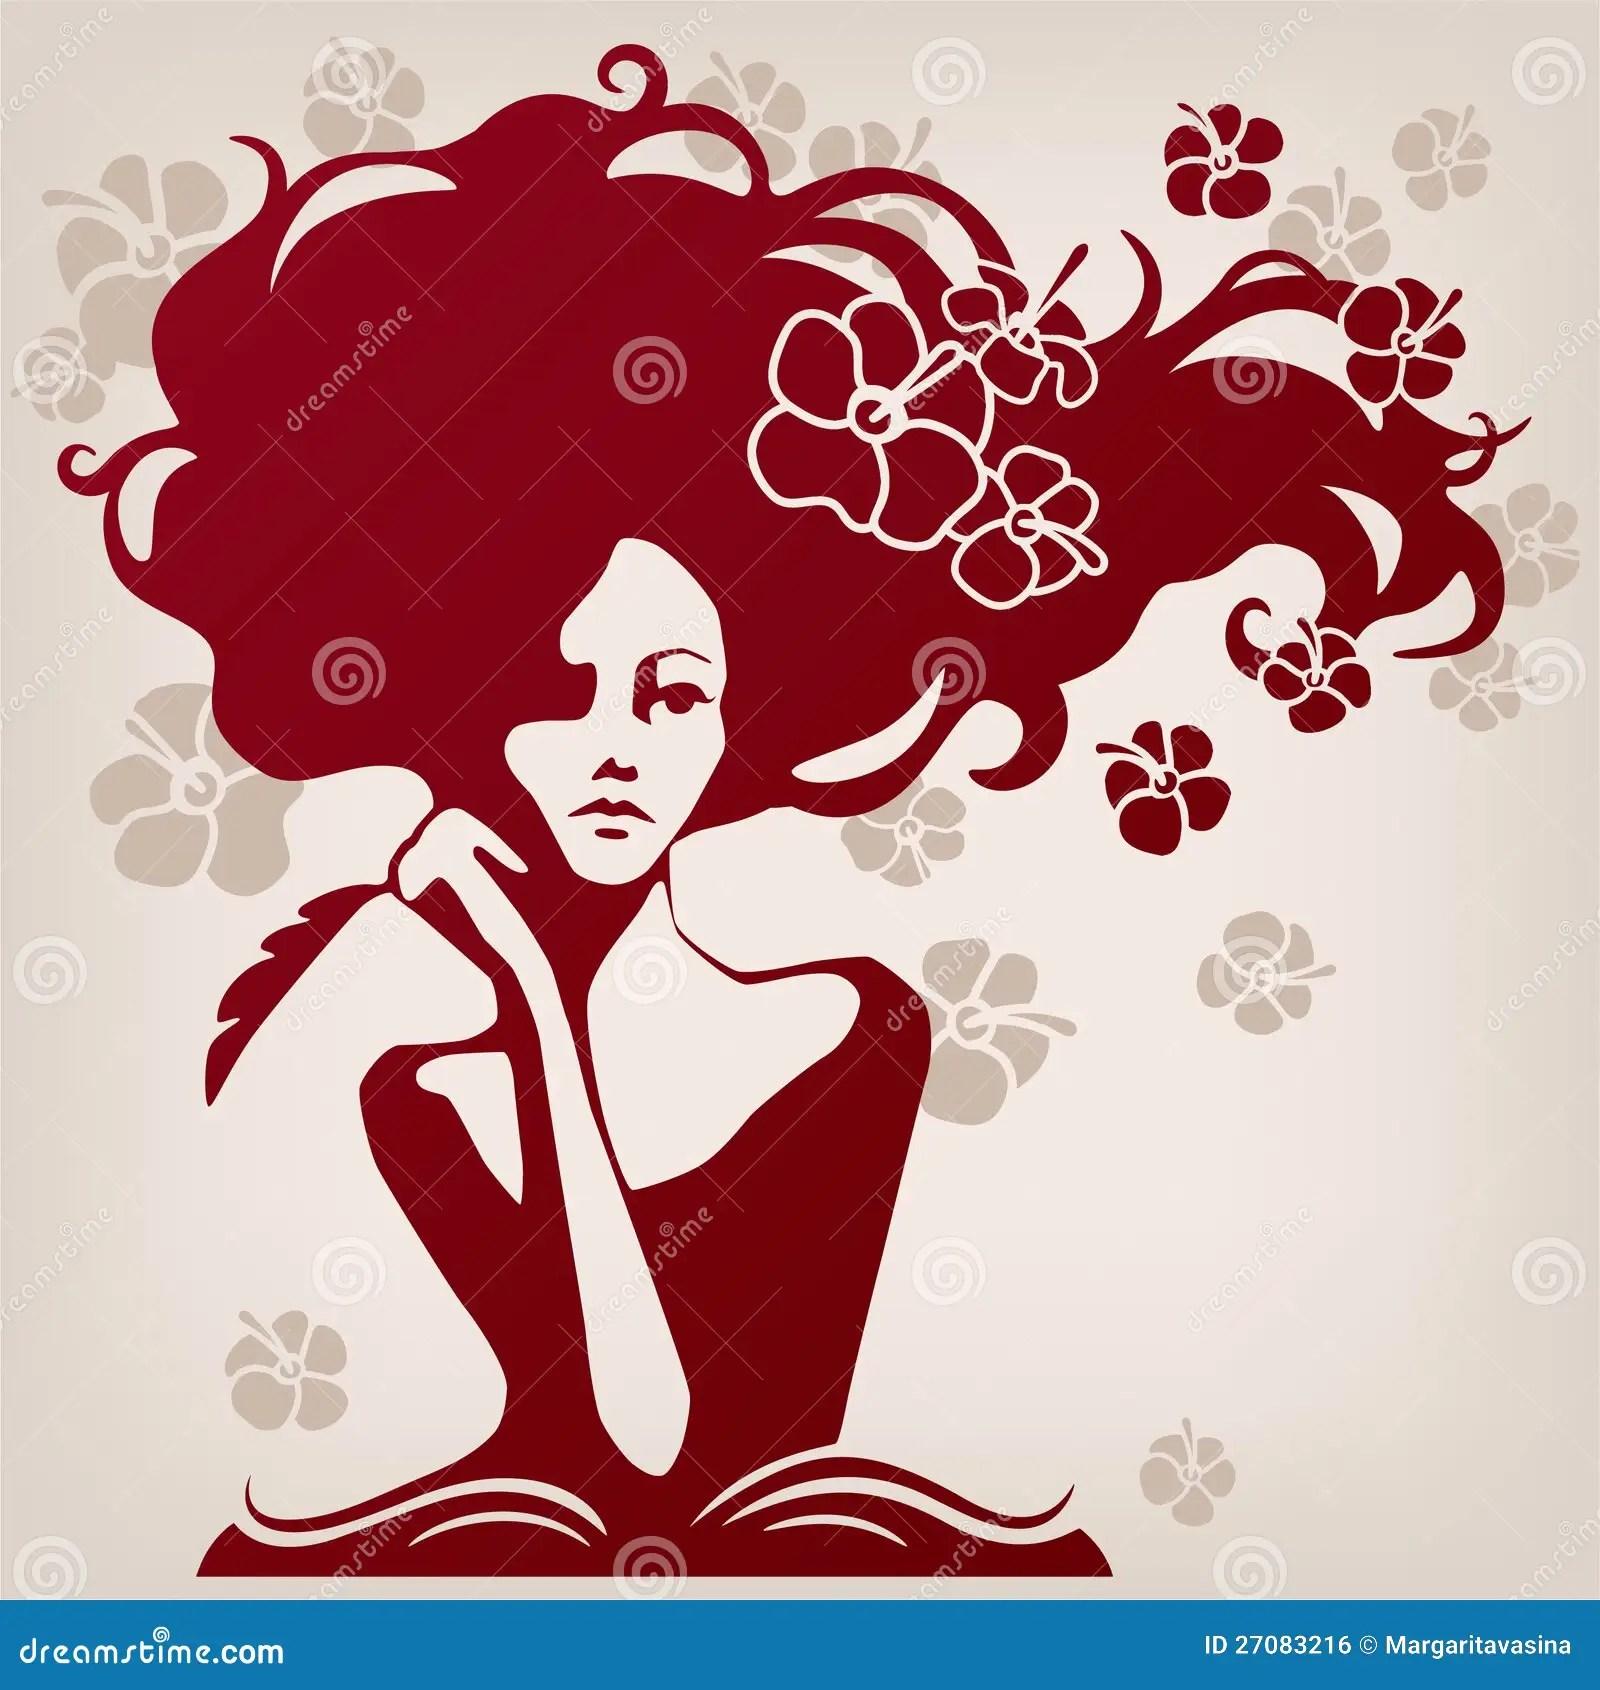 Pretty Girl Cartoon Wallpaper Woman Writer Royalty Free Stock Image Image 27083216